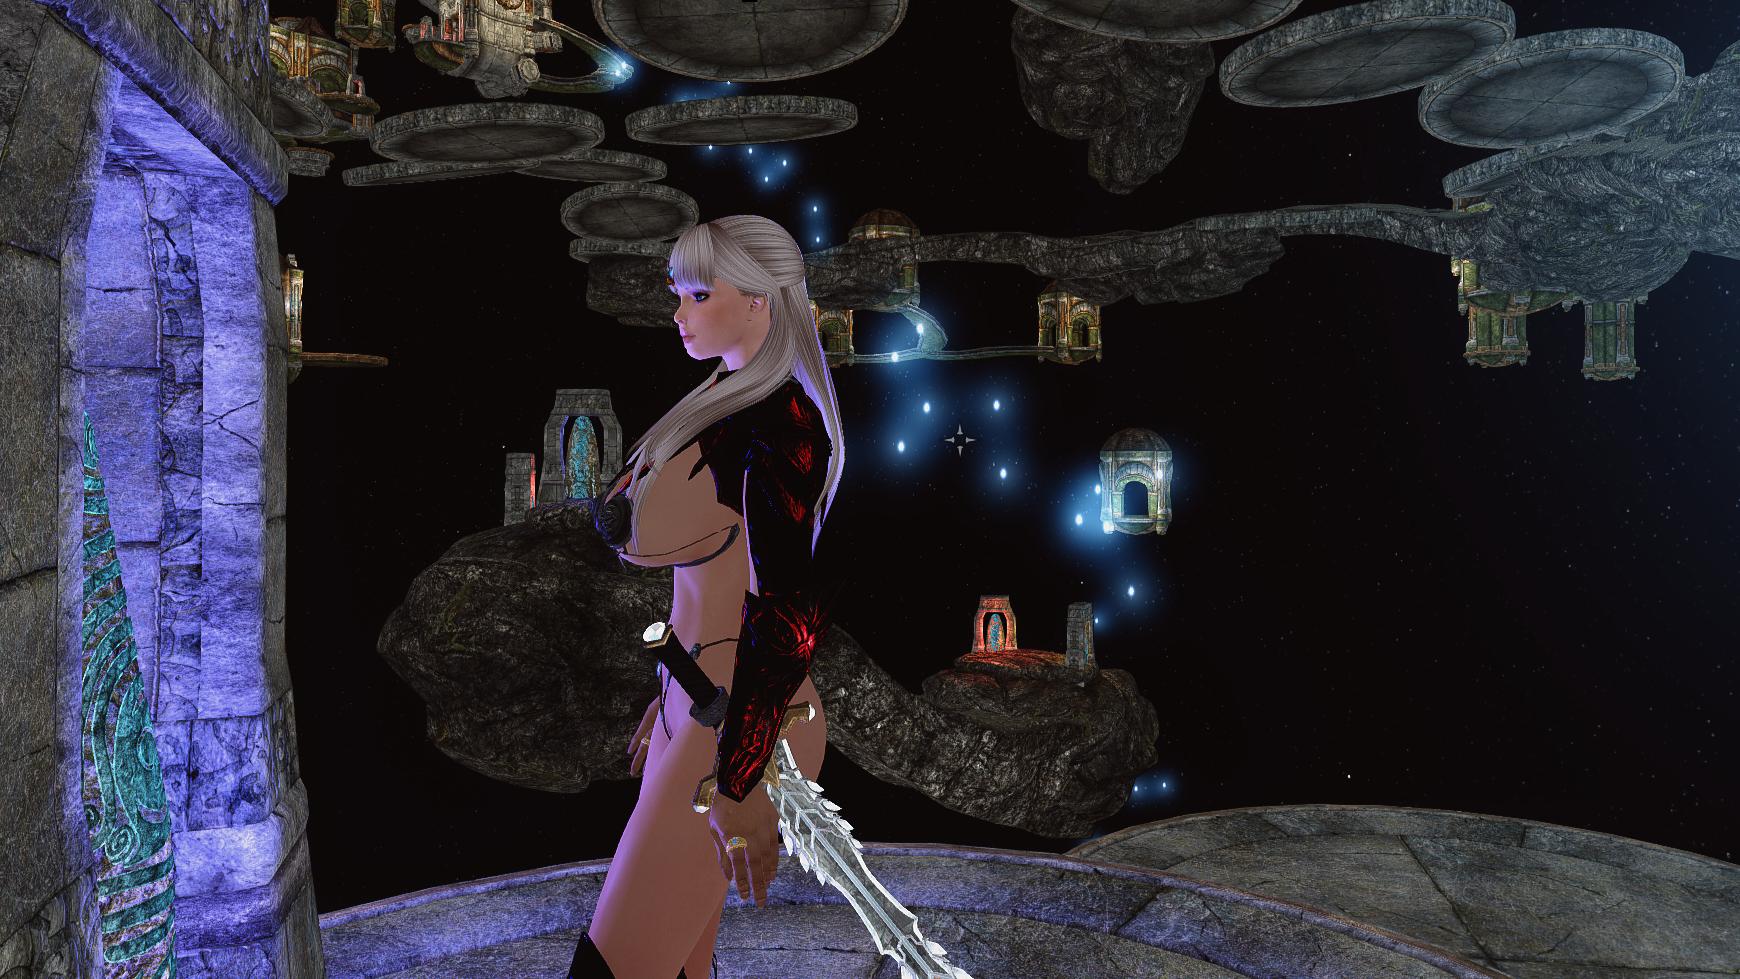 Tes V - Skyrim Screenshot 2018.06.22 - 05.54.09.36.png - Elder Scrolls 5: Skyrim, the